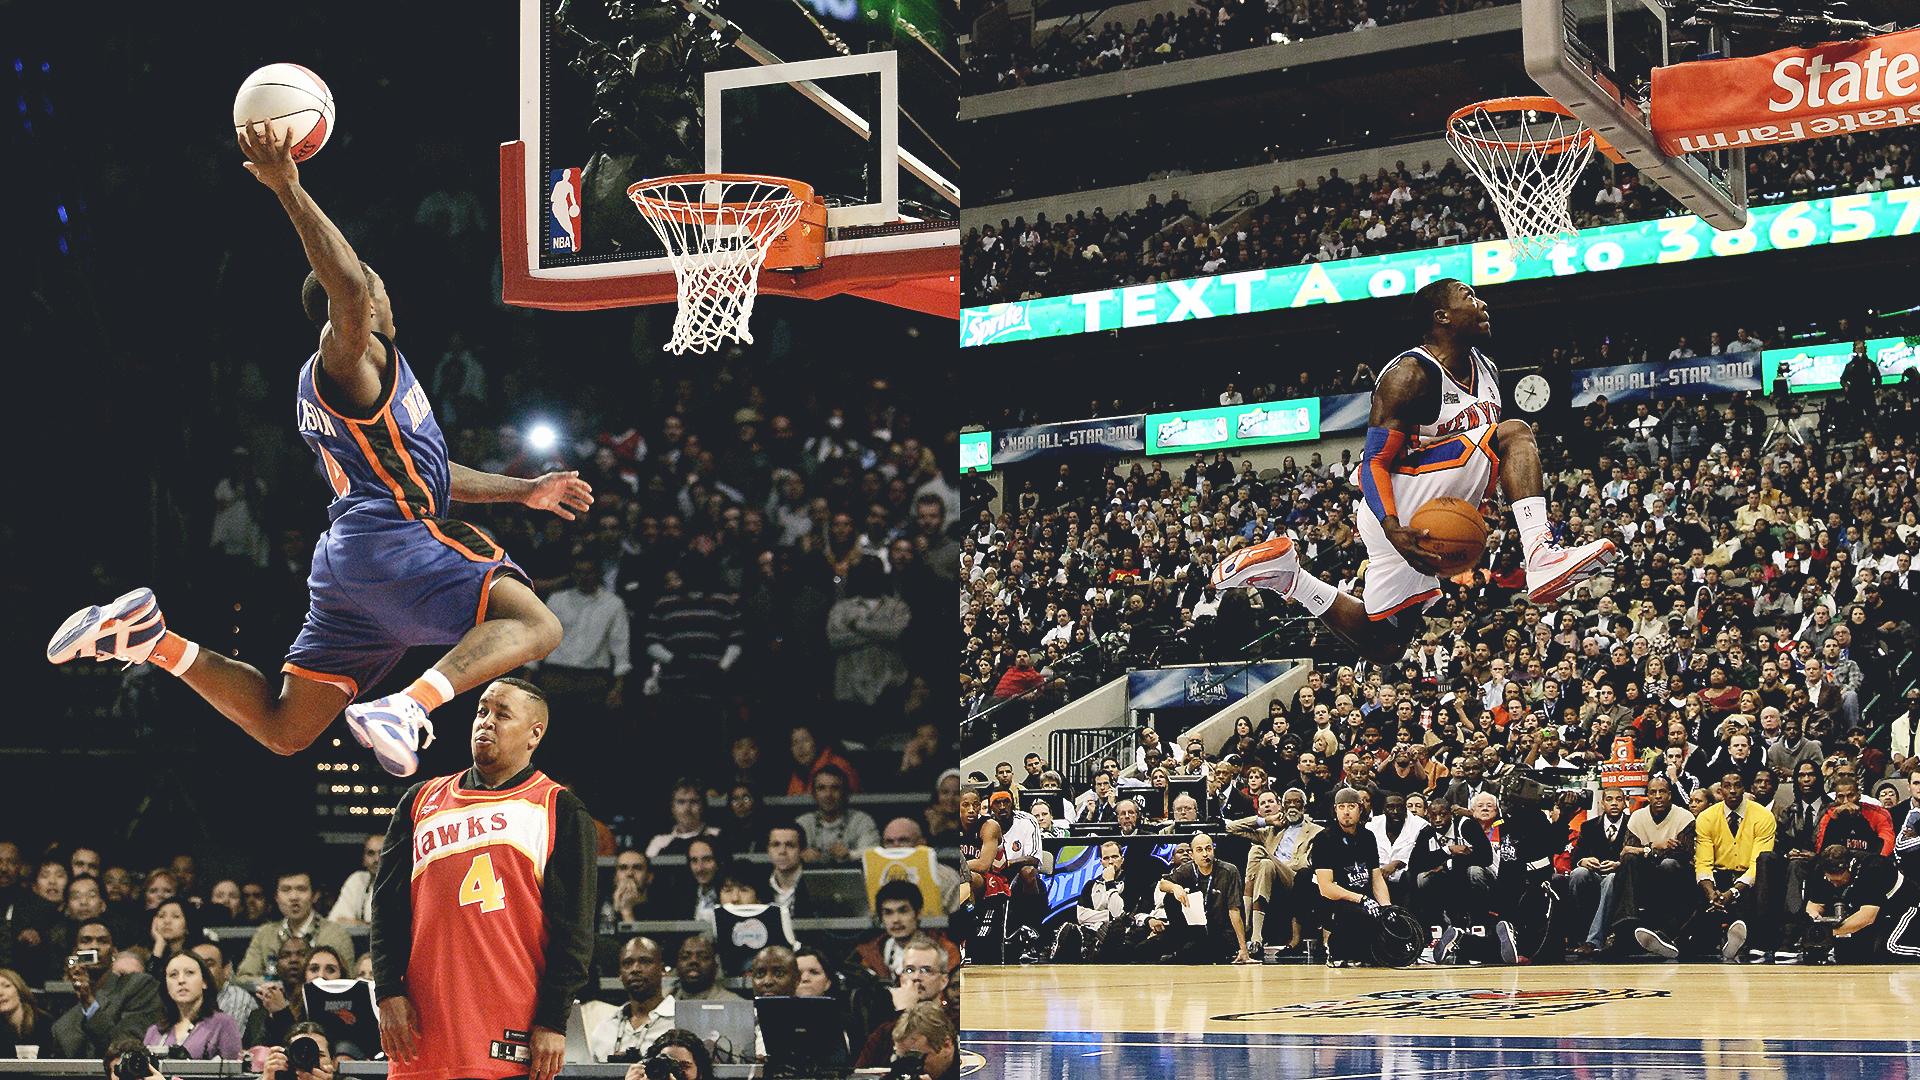 Who is Nate Robinson? NBA career earnings, slam dunk titles sudden boxing career